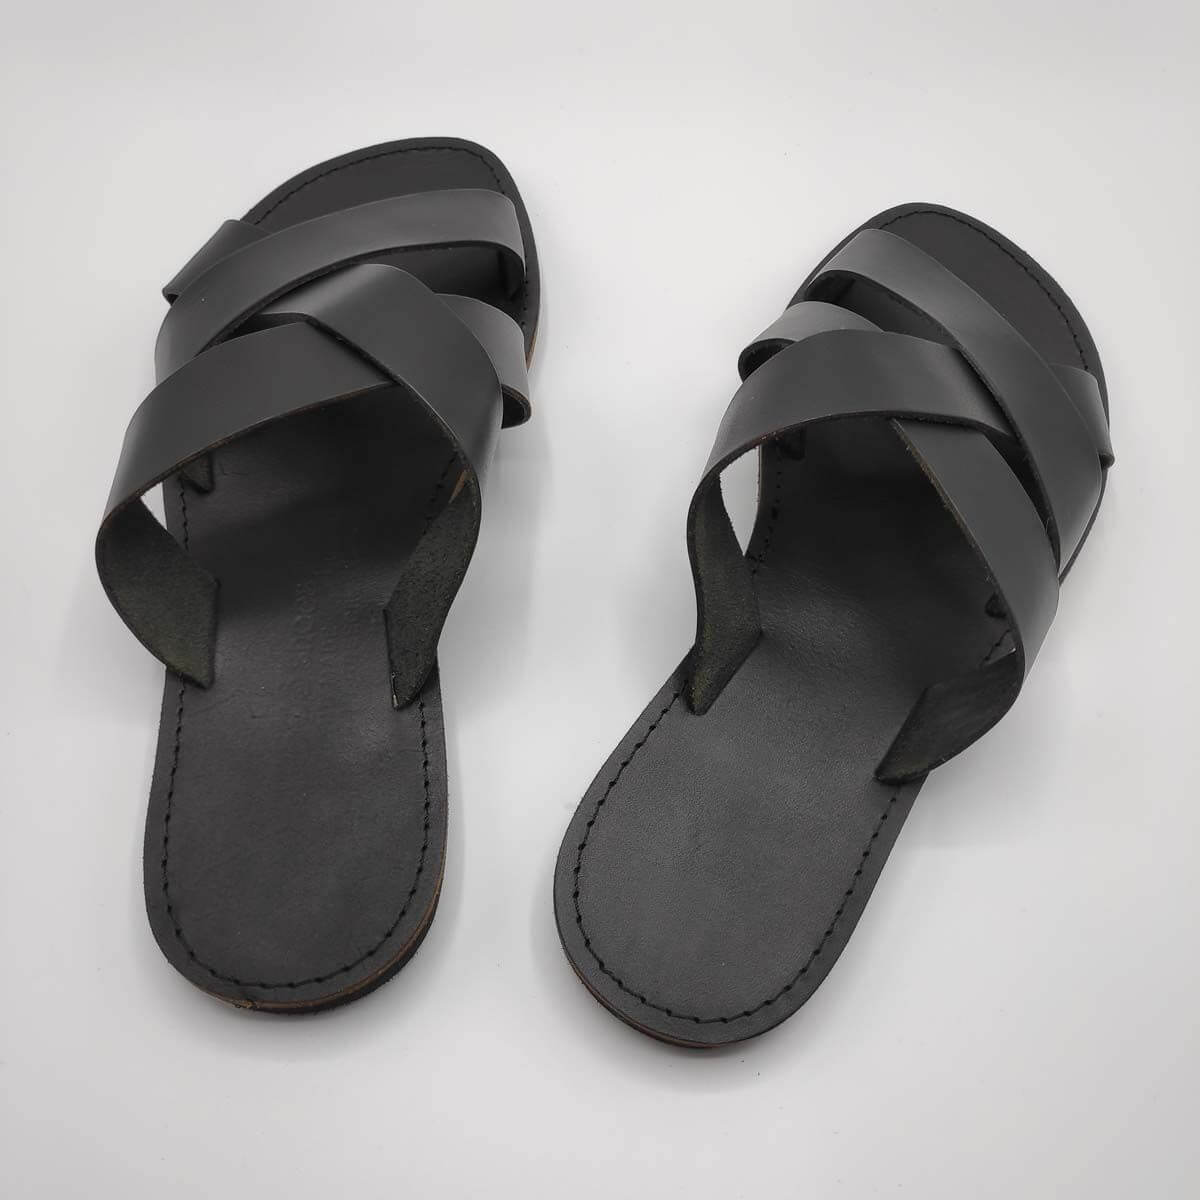 leather sandals for men blackthree straps criss cross black view - Avithos Men